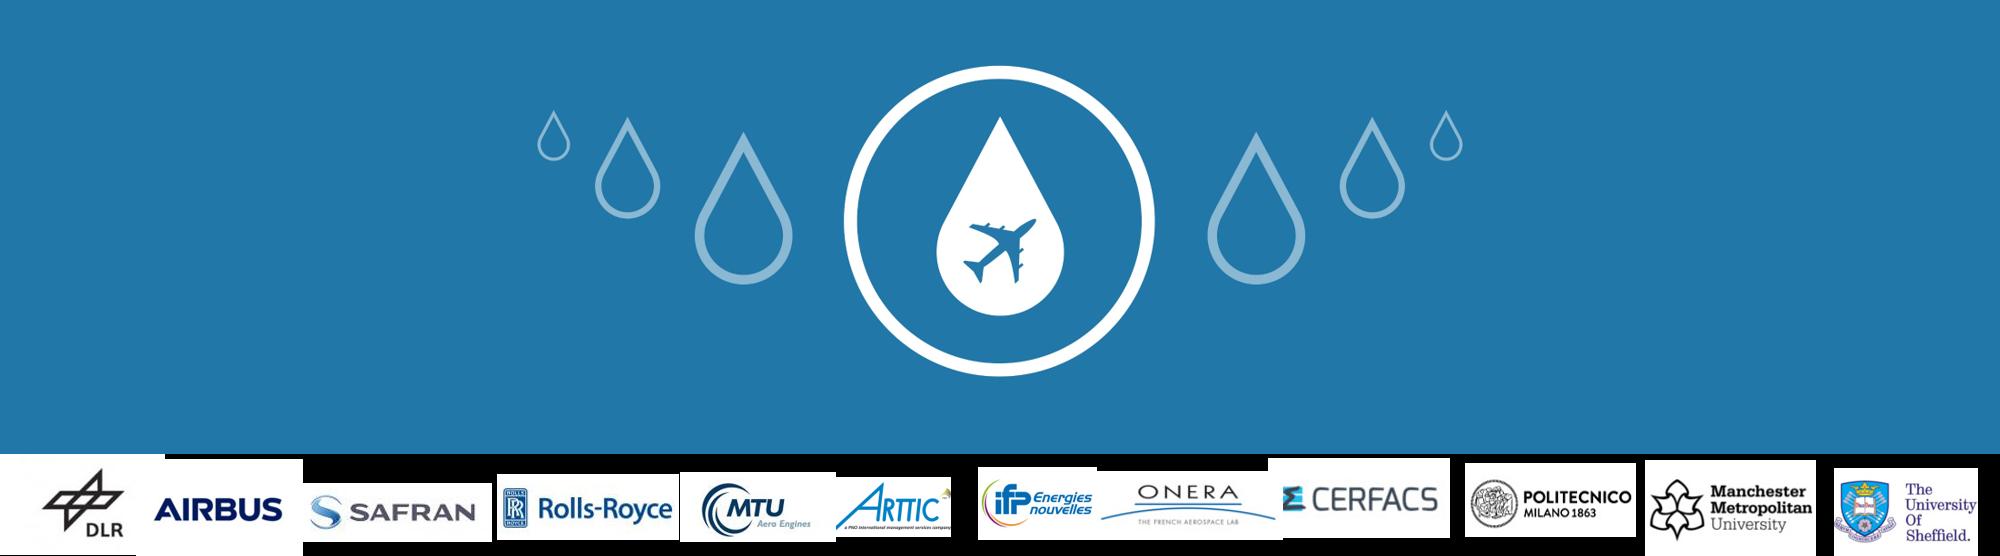 Maximizing sustainable aviation fuel benefits beyond CO2 reduction